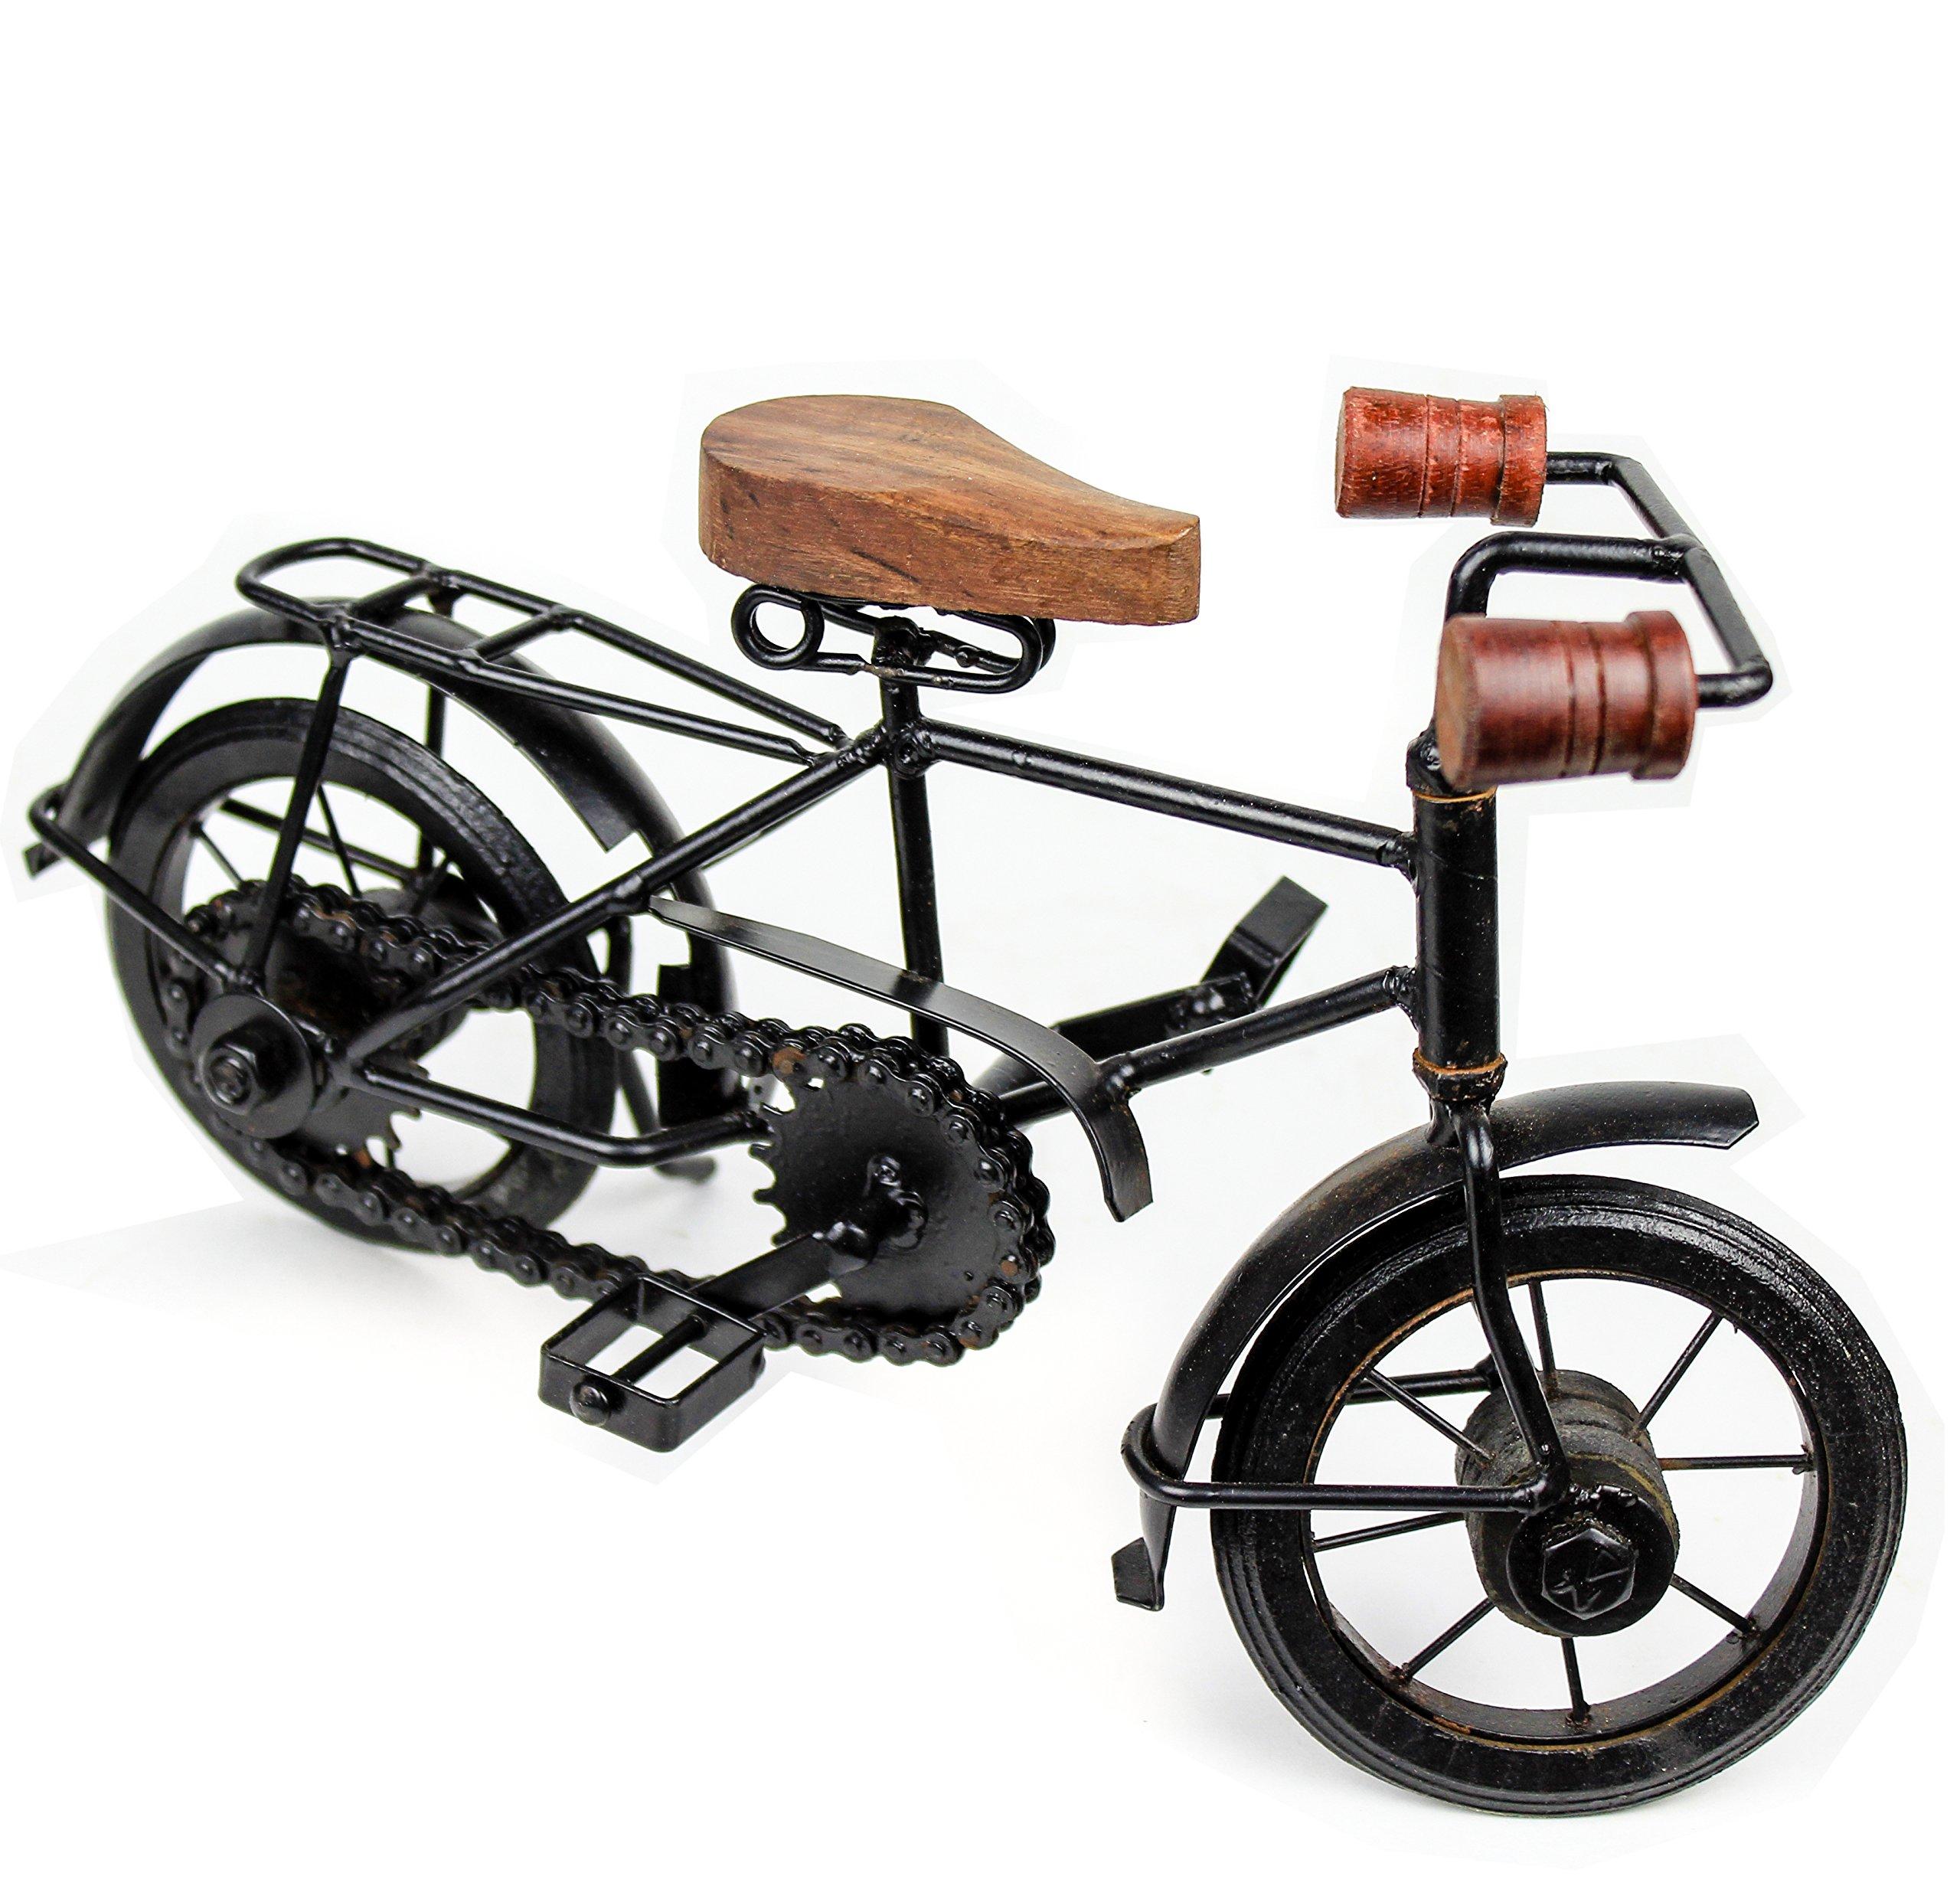 Nagina International Home Decor Iron Metal Crafted Beautiful Finger Bike   Table Decor Gifts Vehicle   Games Toy Cycle (Postman) by Nagina International (Image #4)